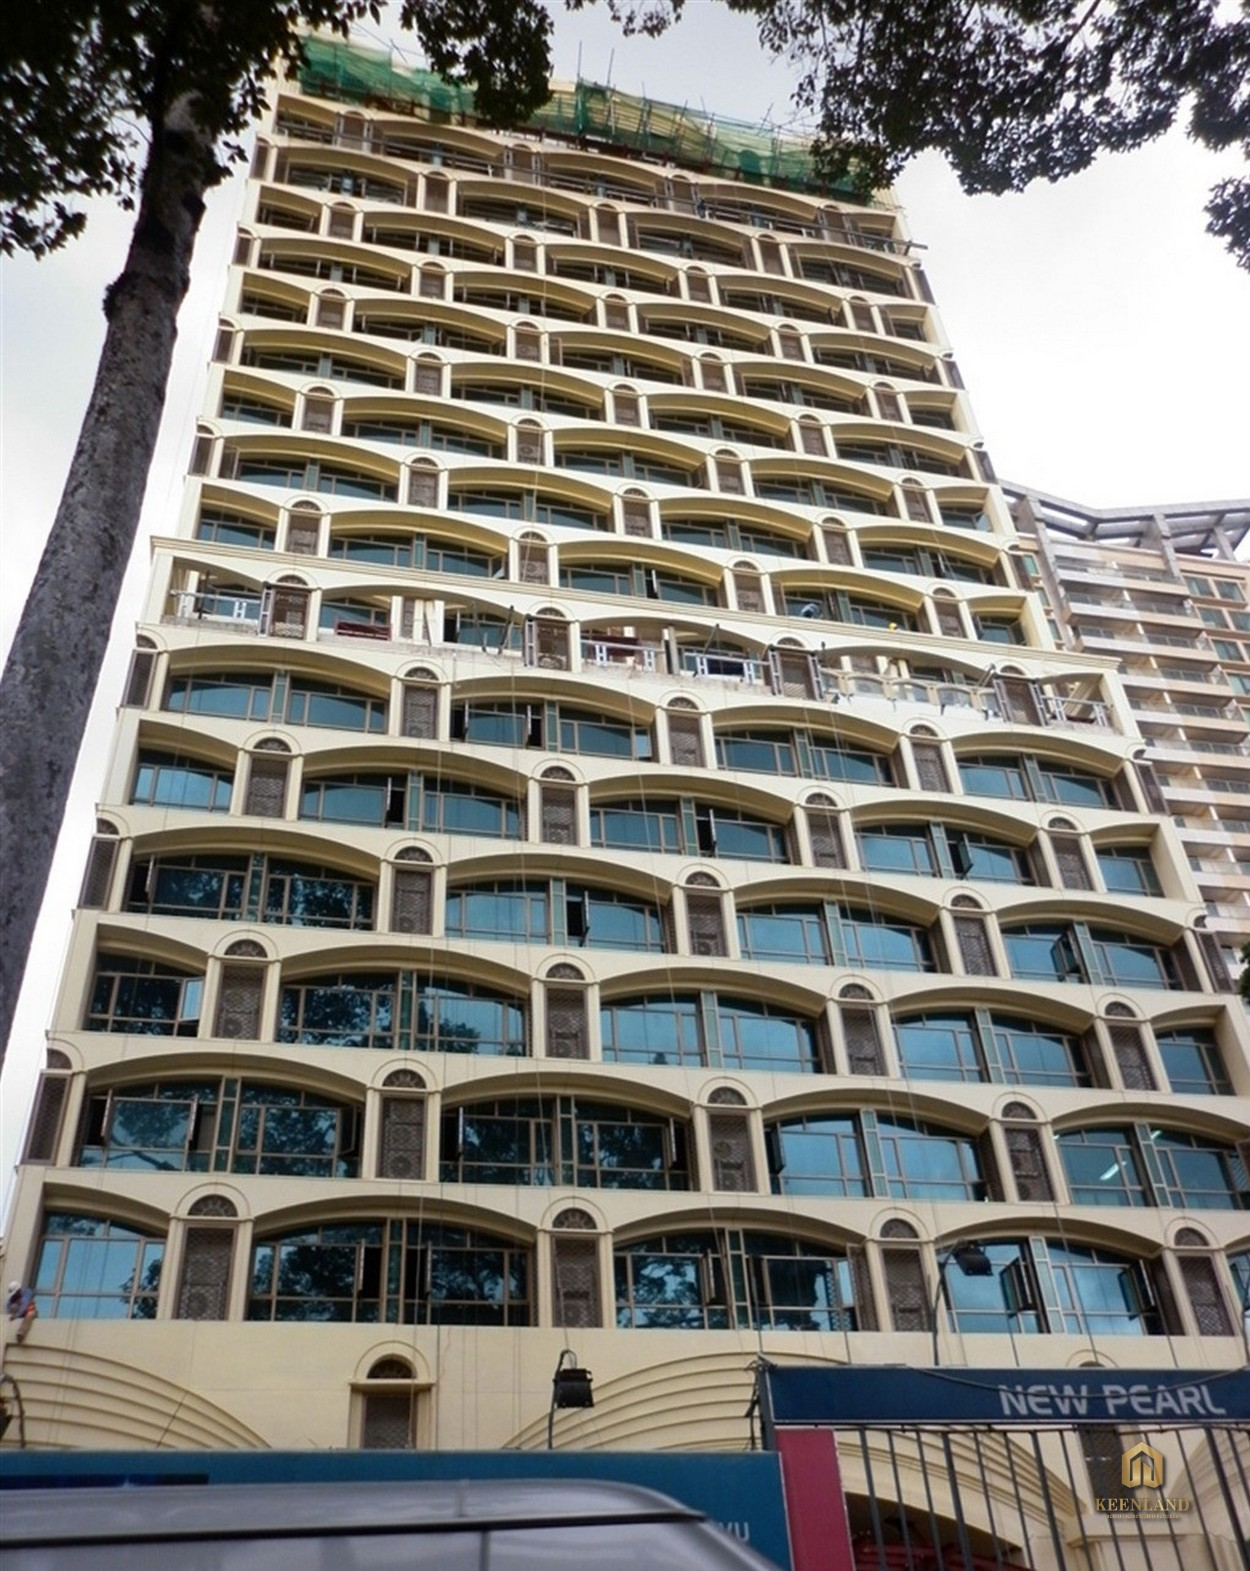 Cận cảnh mặt tiền New Pearl Residence